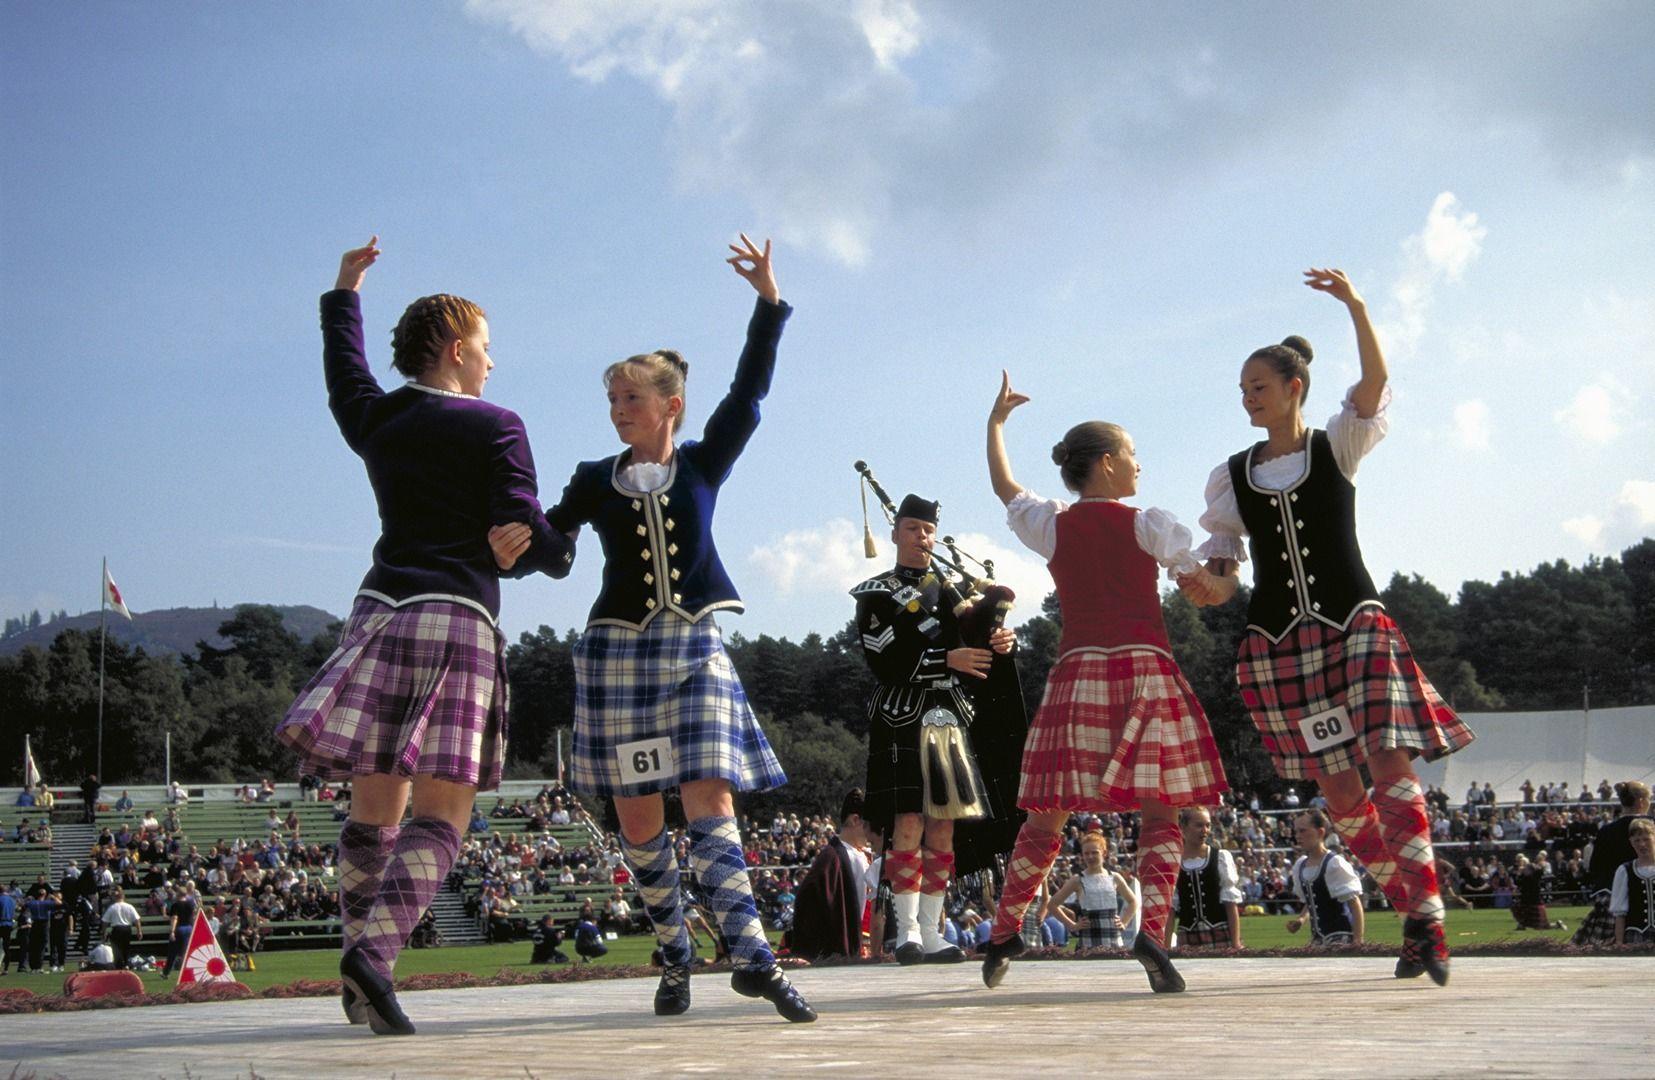 Emerald Isle Tour Scottish highland games, Day trips